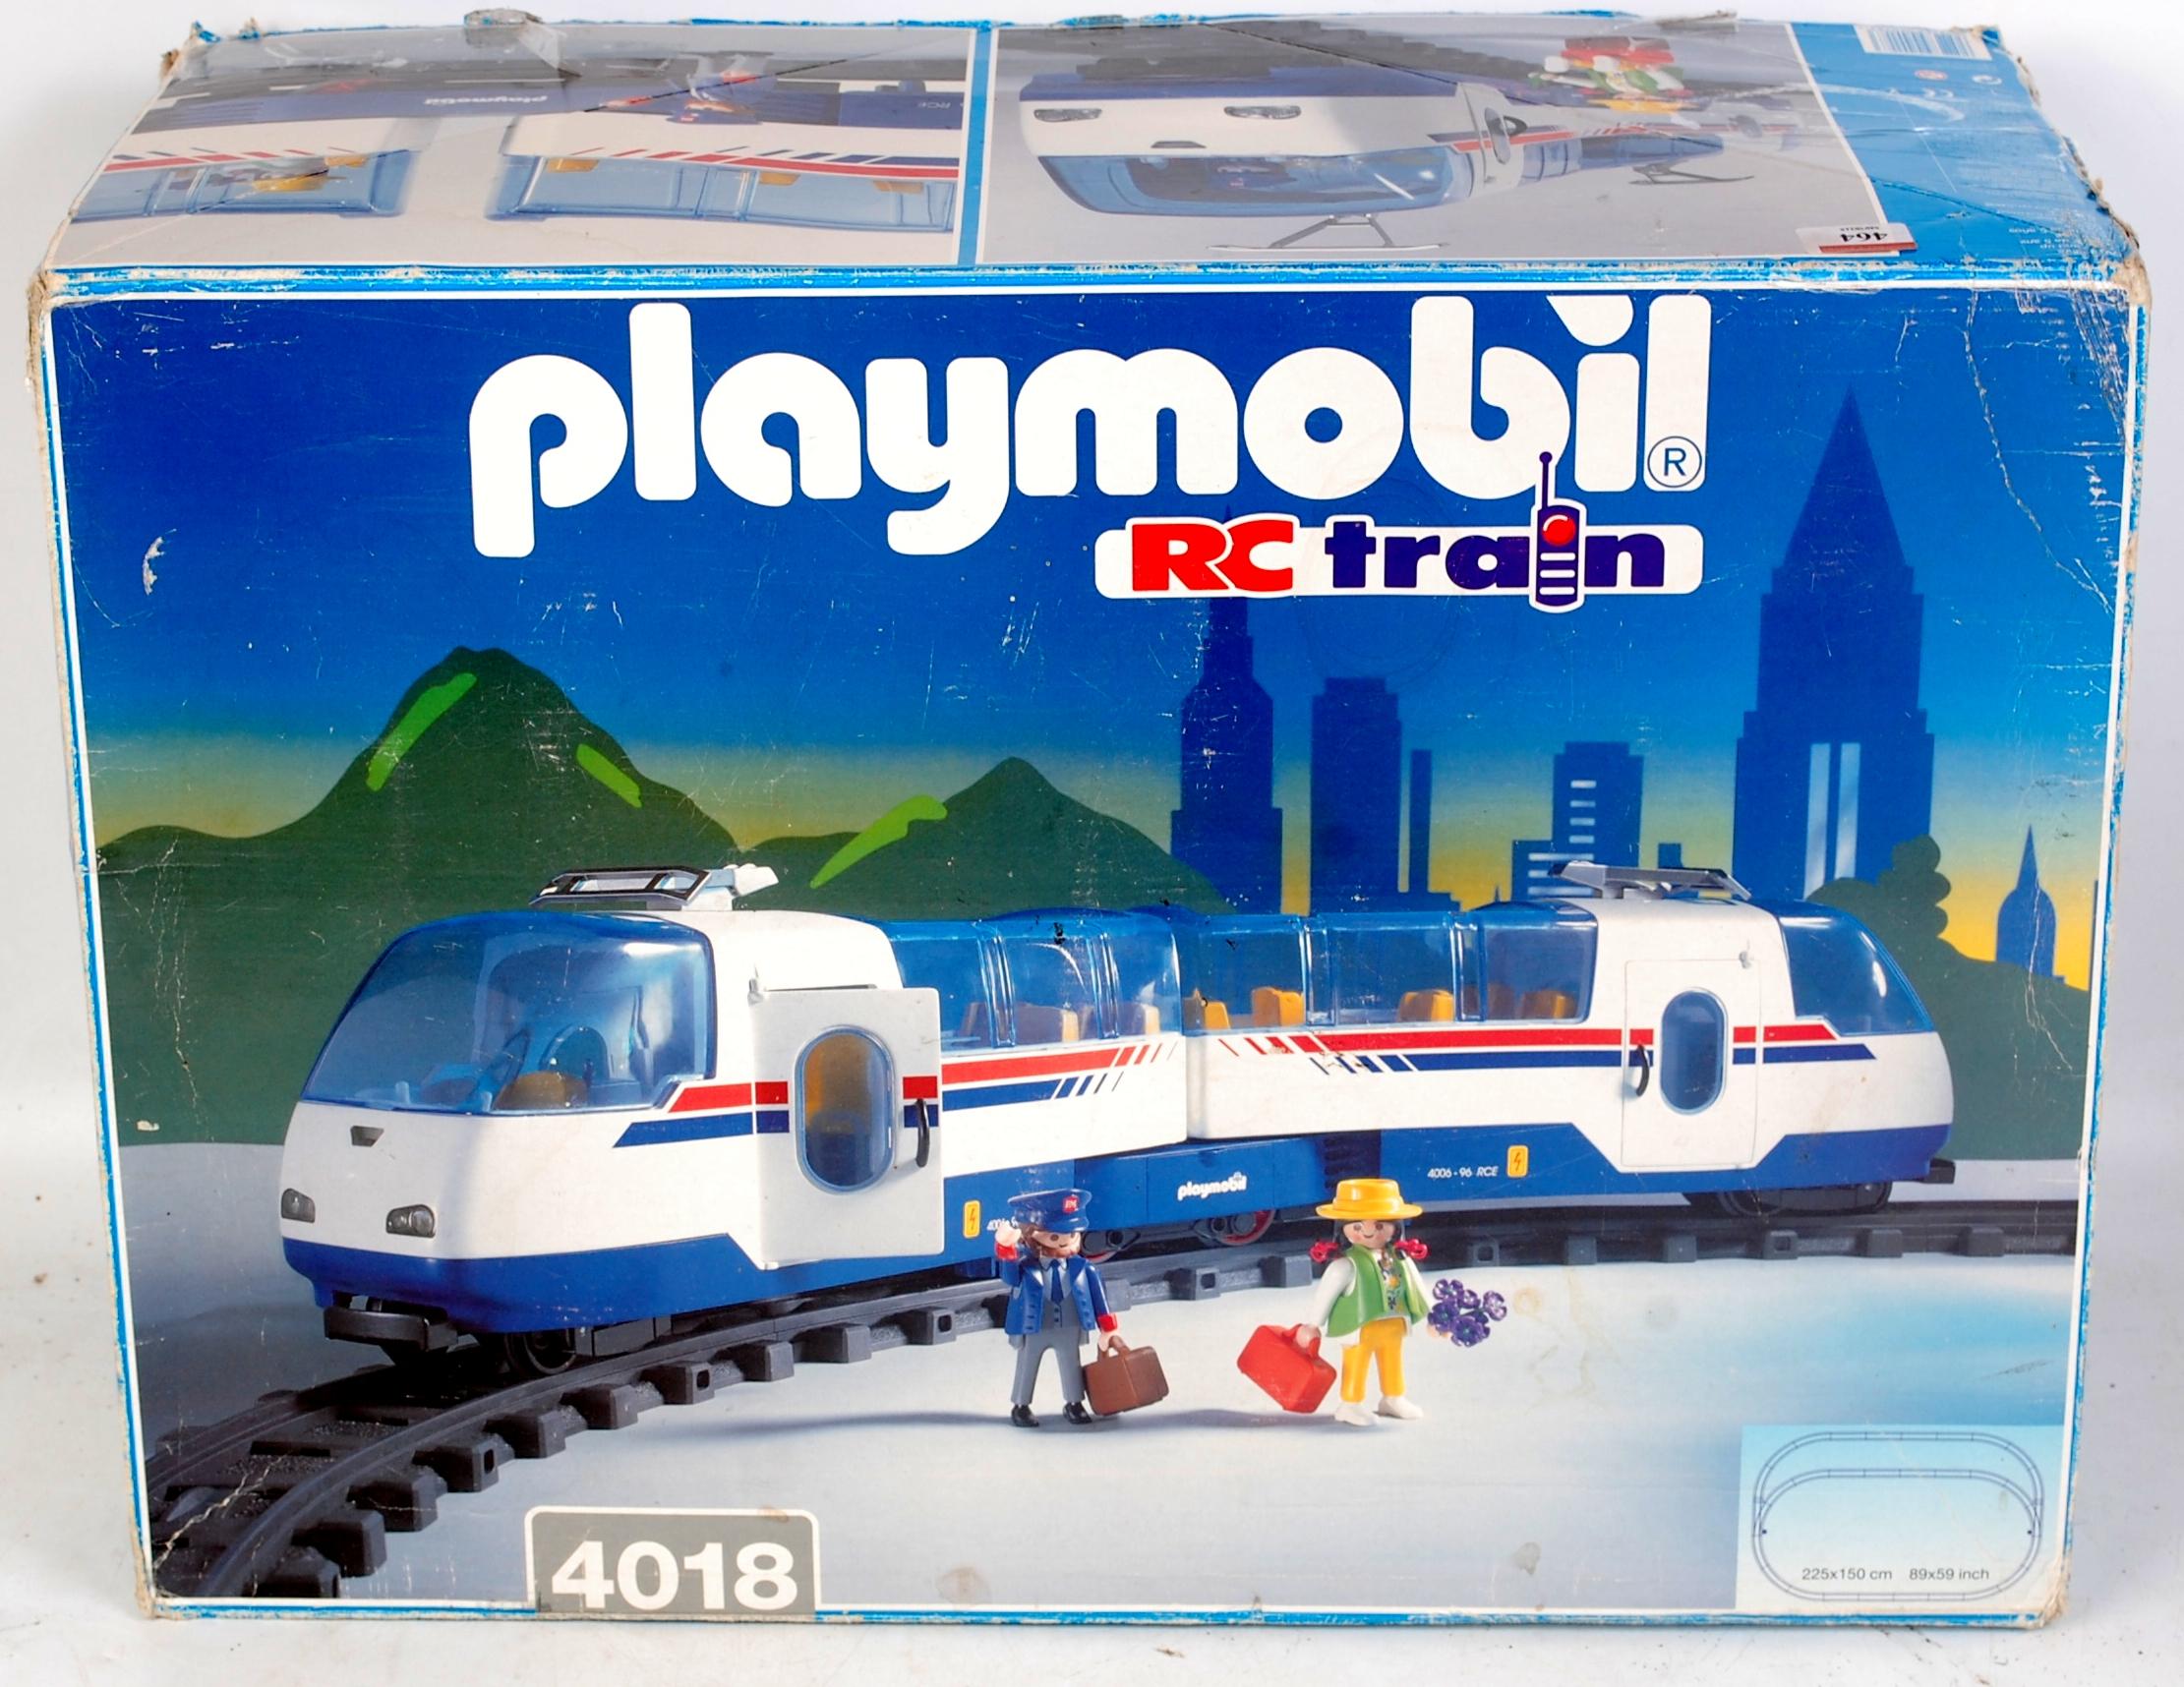 Playmobil Set 4018 G Gauge Remote Control Train Set